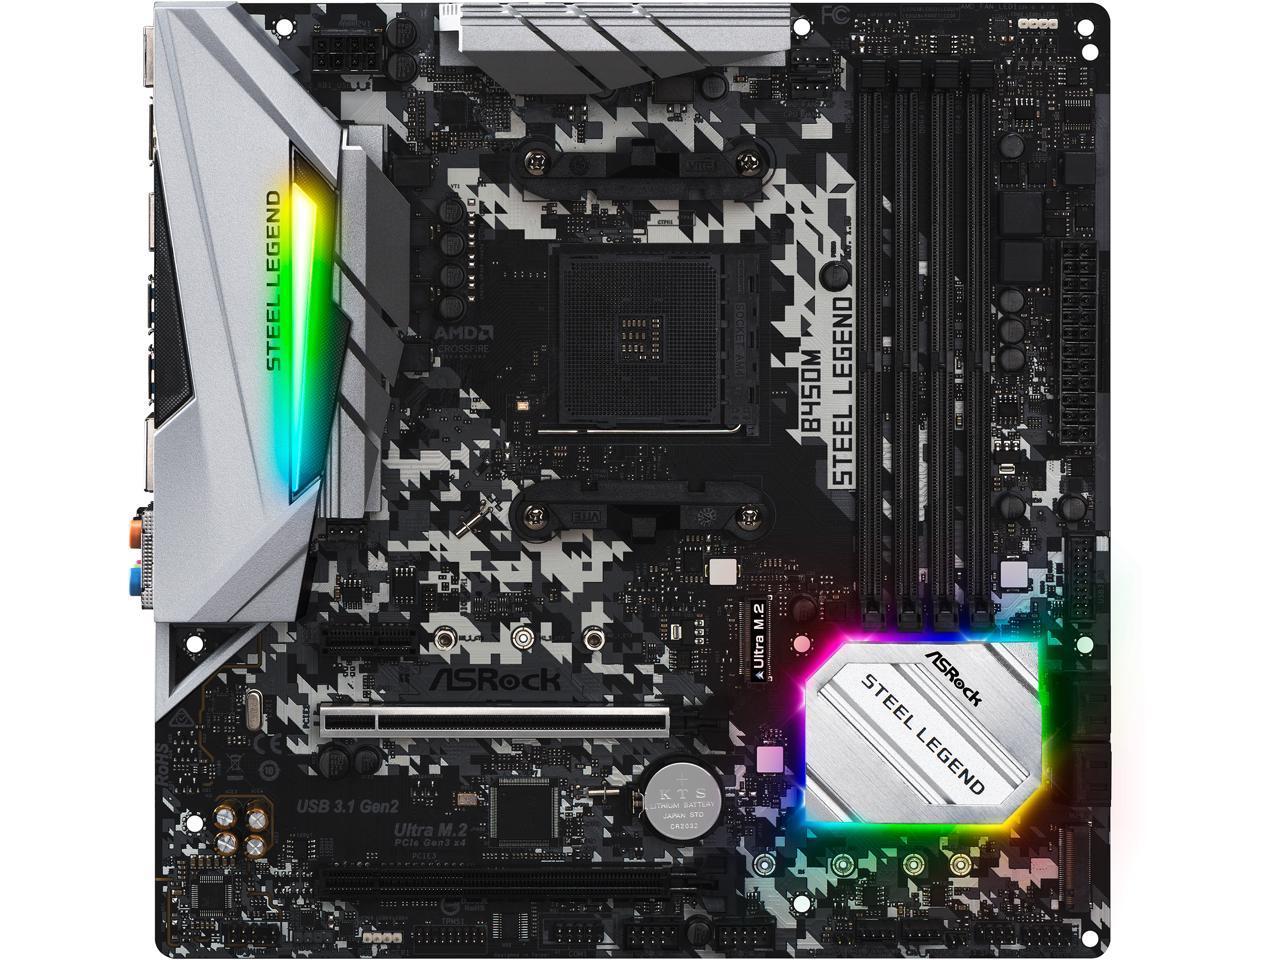 Details about ASRock B450M Steel Legend AM4 AMD Promontory B450 SATA 6Gb/s  USB 3 1 HDMI Micro